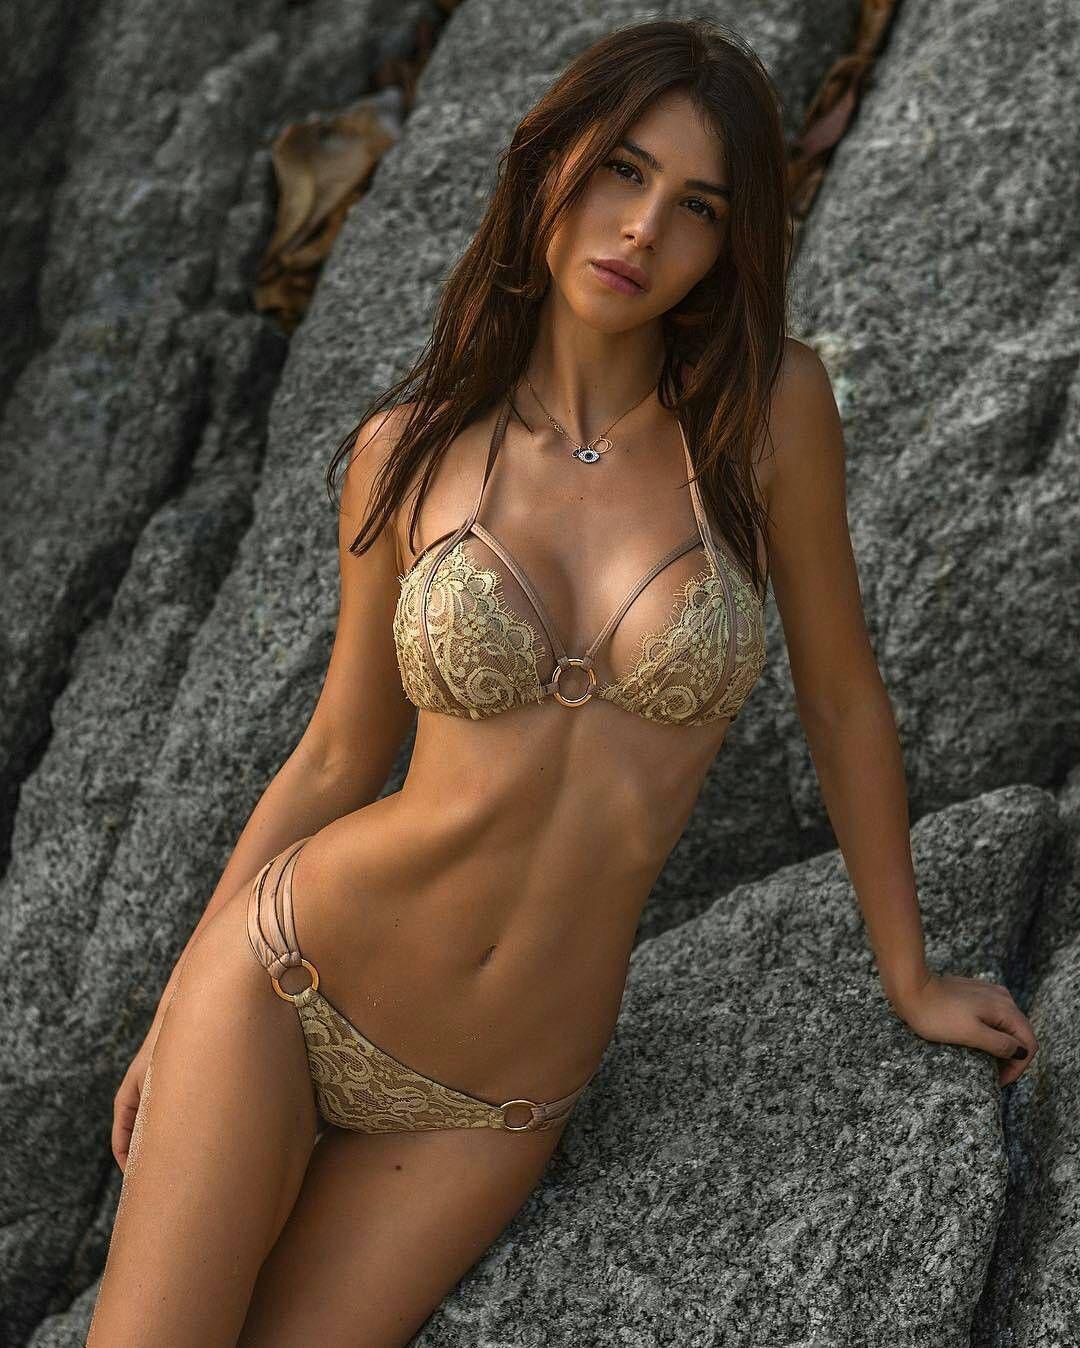 Sexy russian girls vs bbc music video